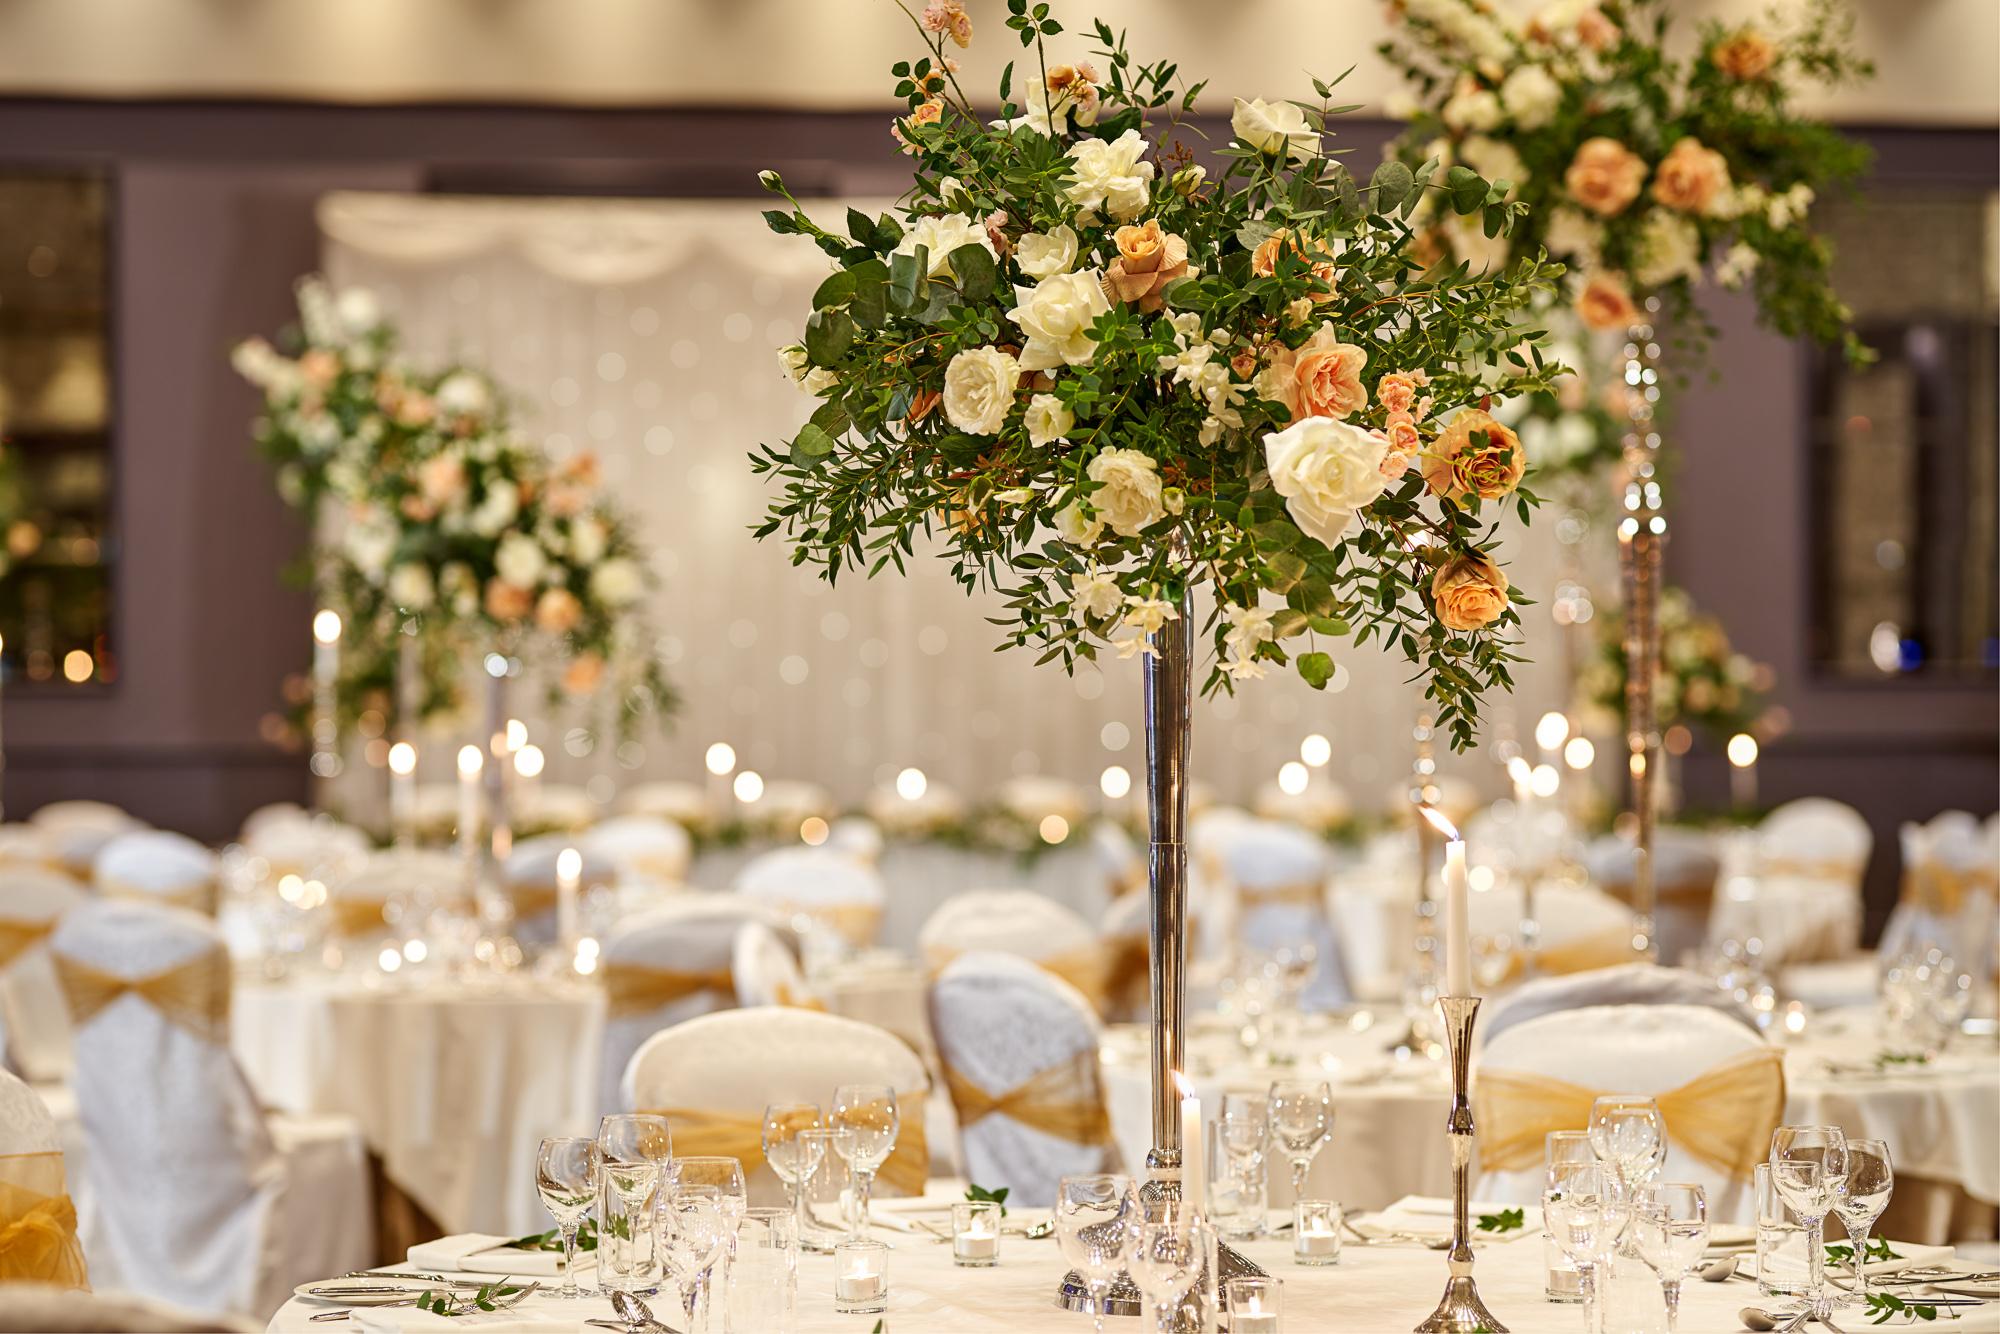 Galmont Wedding 5 2000px.jpg